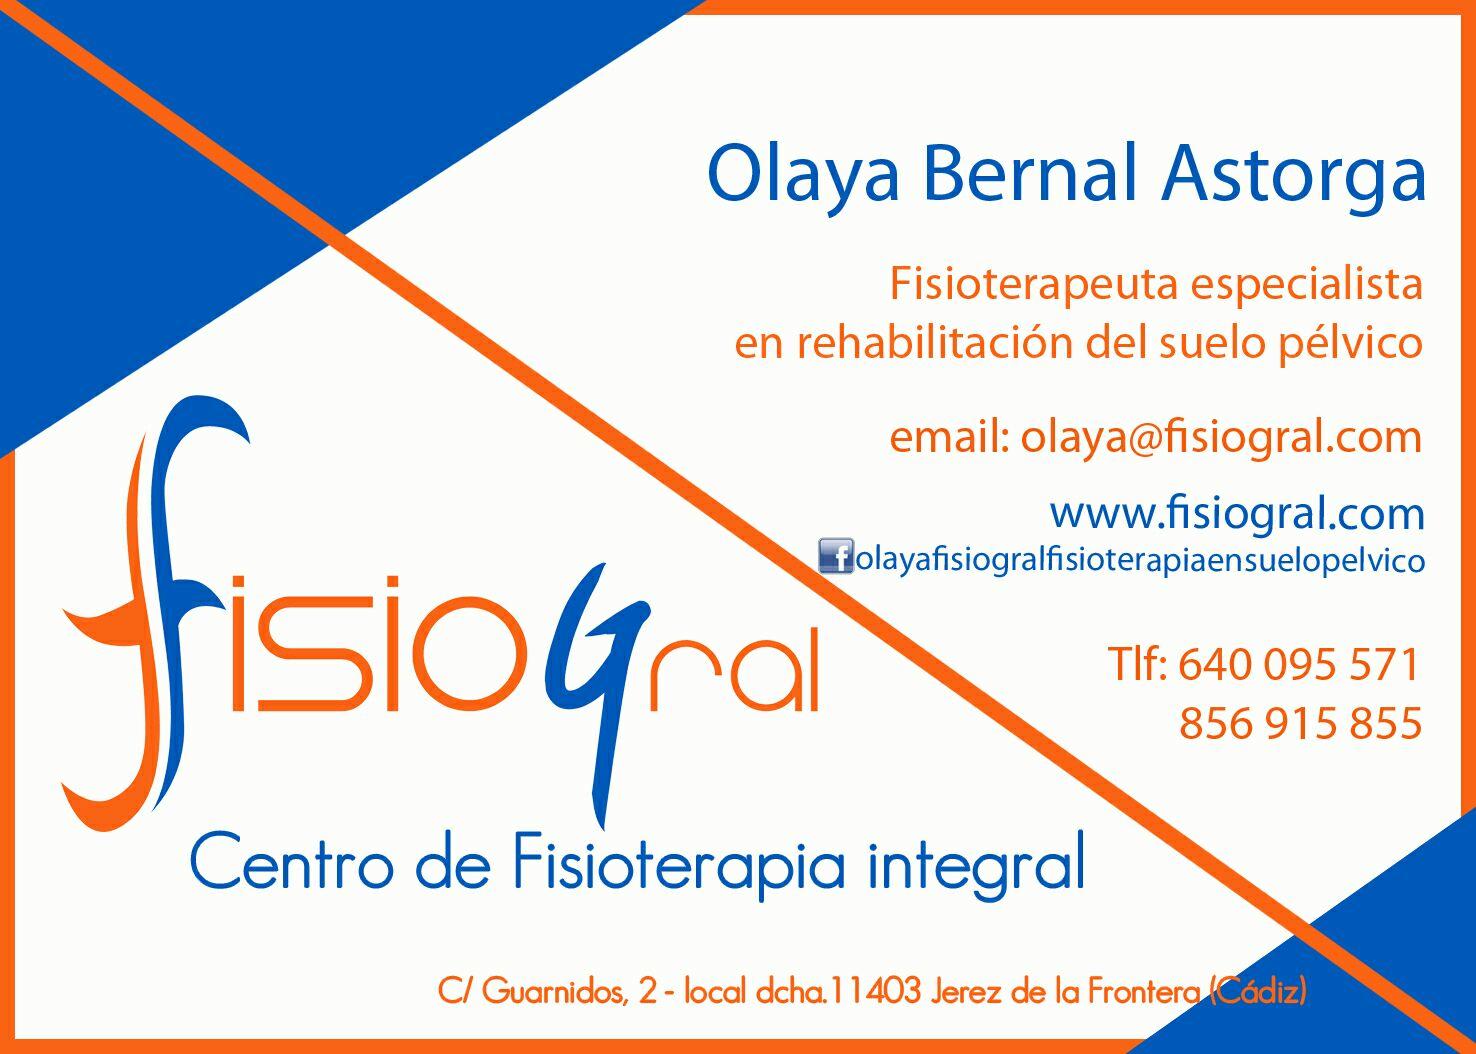 Olaya Bernal Astorga